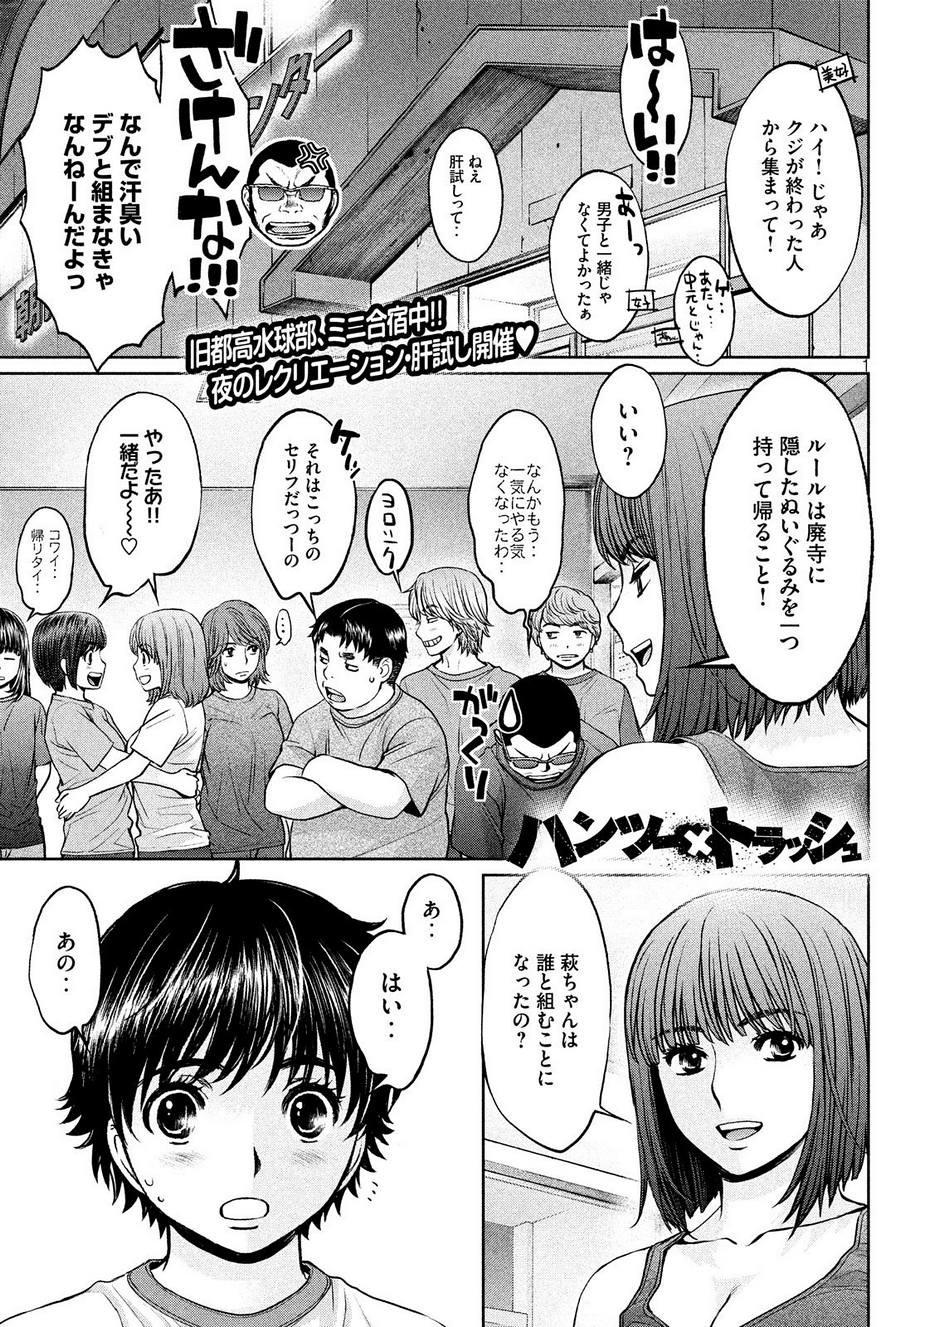 Hantsu x Trash - Chapter 178 - Page 1